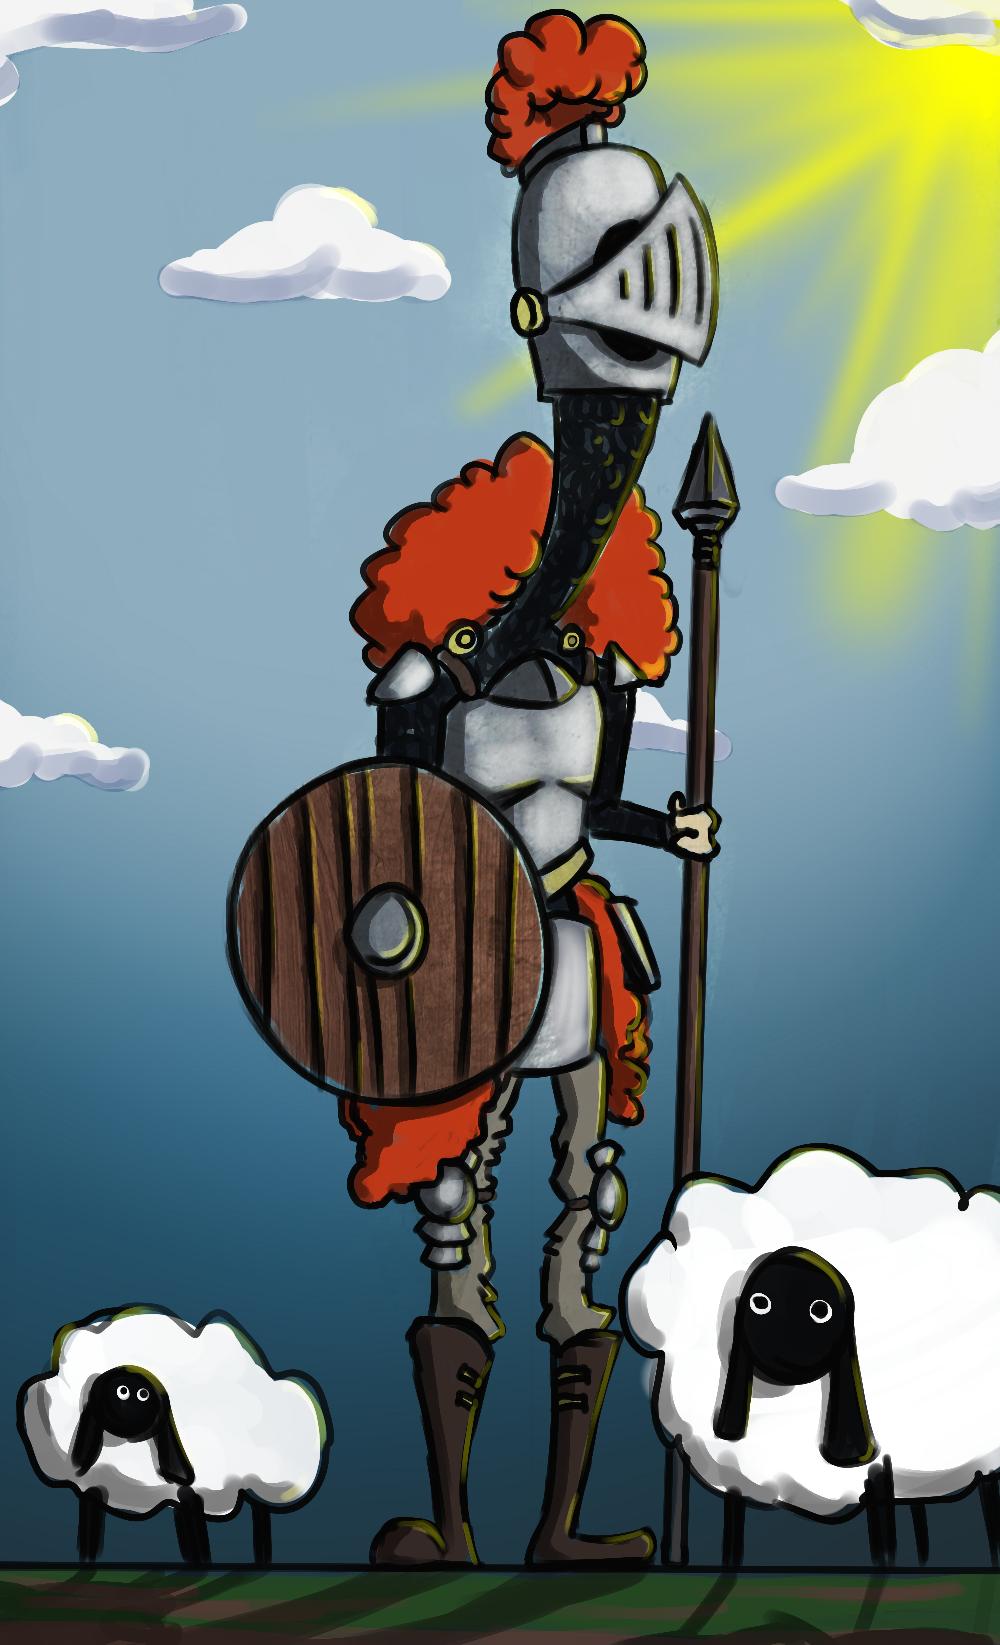 Knight shepherd